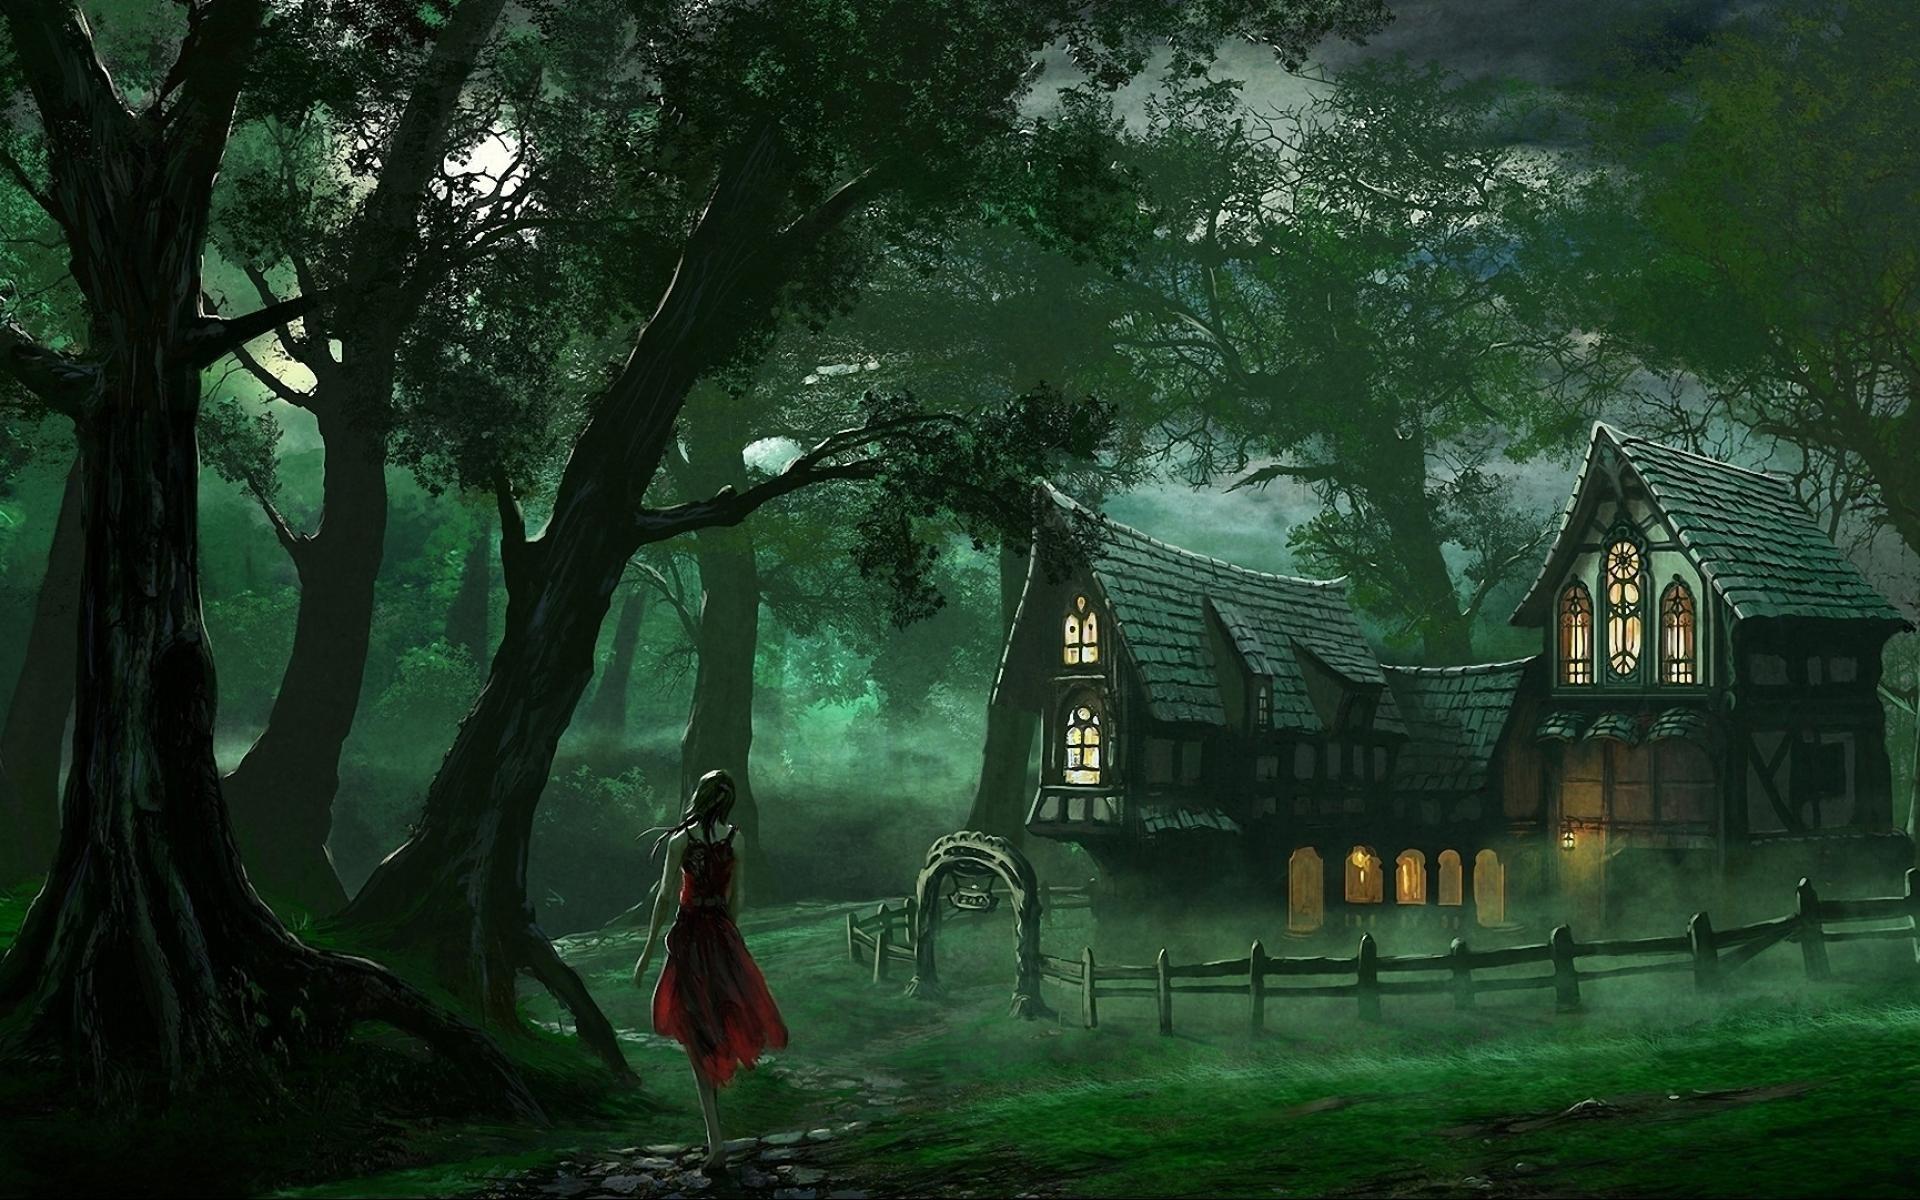 Most Inspiring Wallpaper Night Fairy - fairy-tale-night  HD-351293.jpg